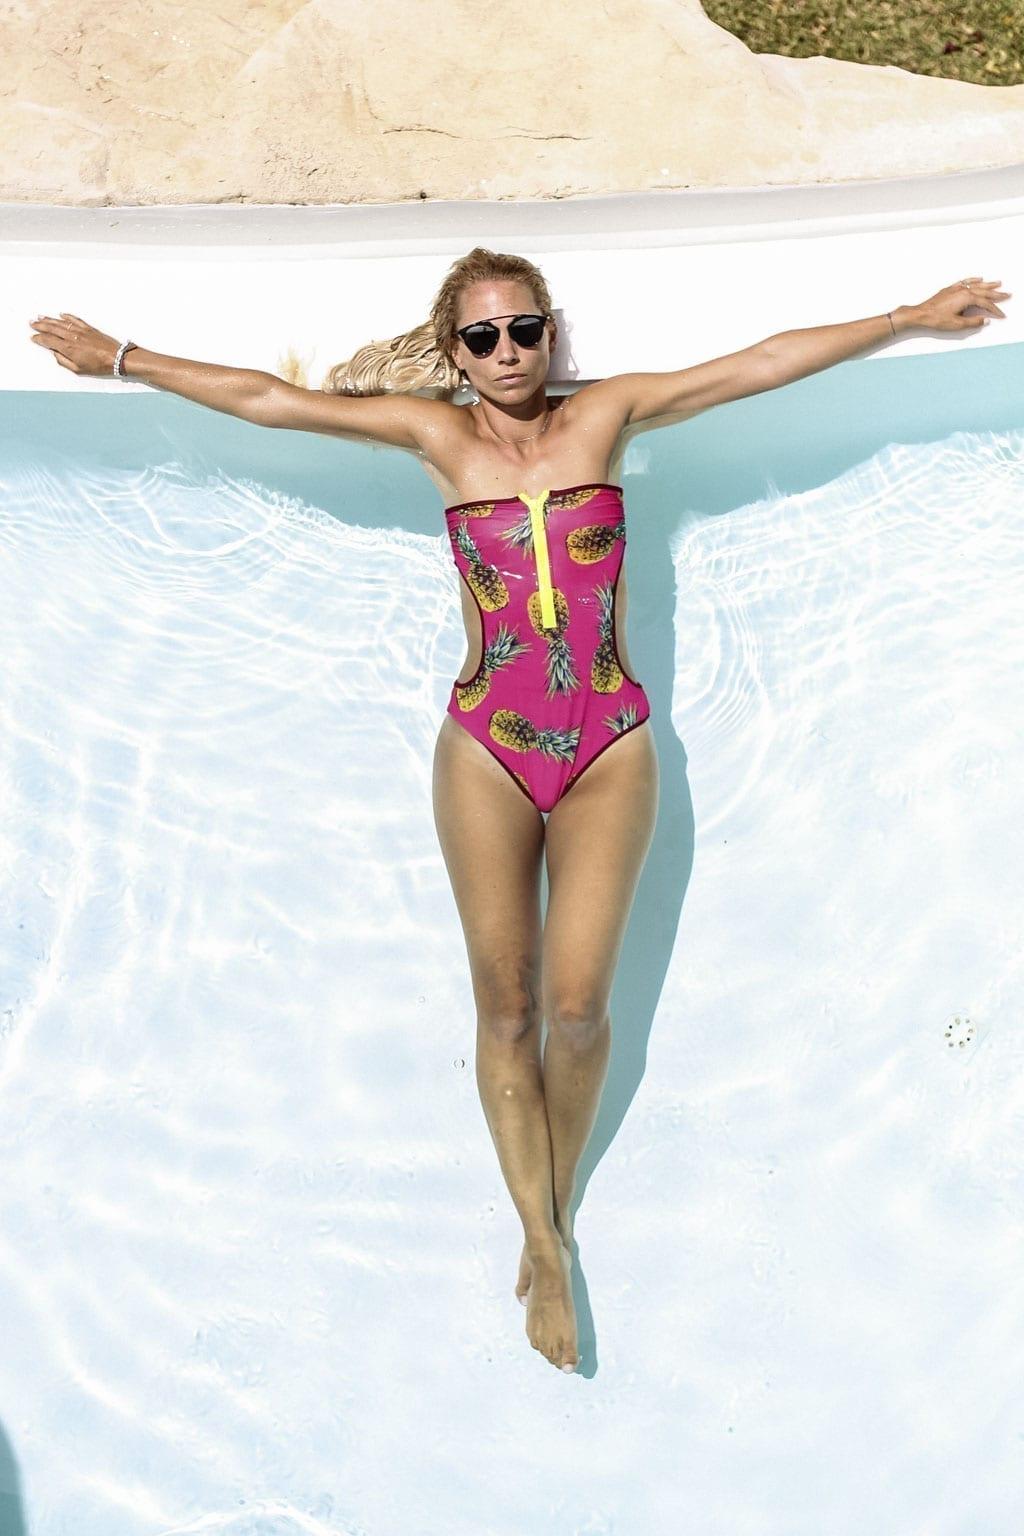 CK-1606_Sardinien-Sardegna-Sardinia-Italy-Italia-Fashion-Blog-Beach-Caribbean-Dress-Blonde-Karin-Kaswurm-Bikini-Kiini-0887